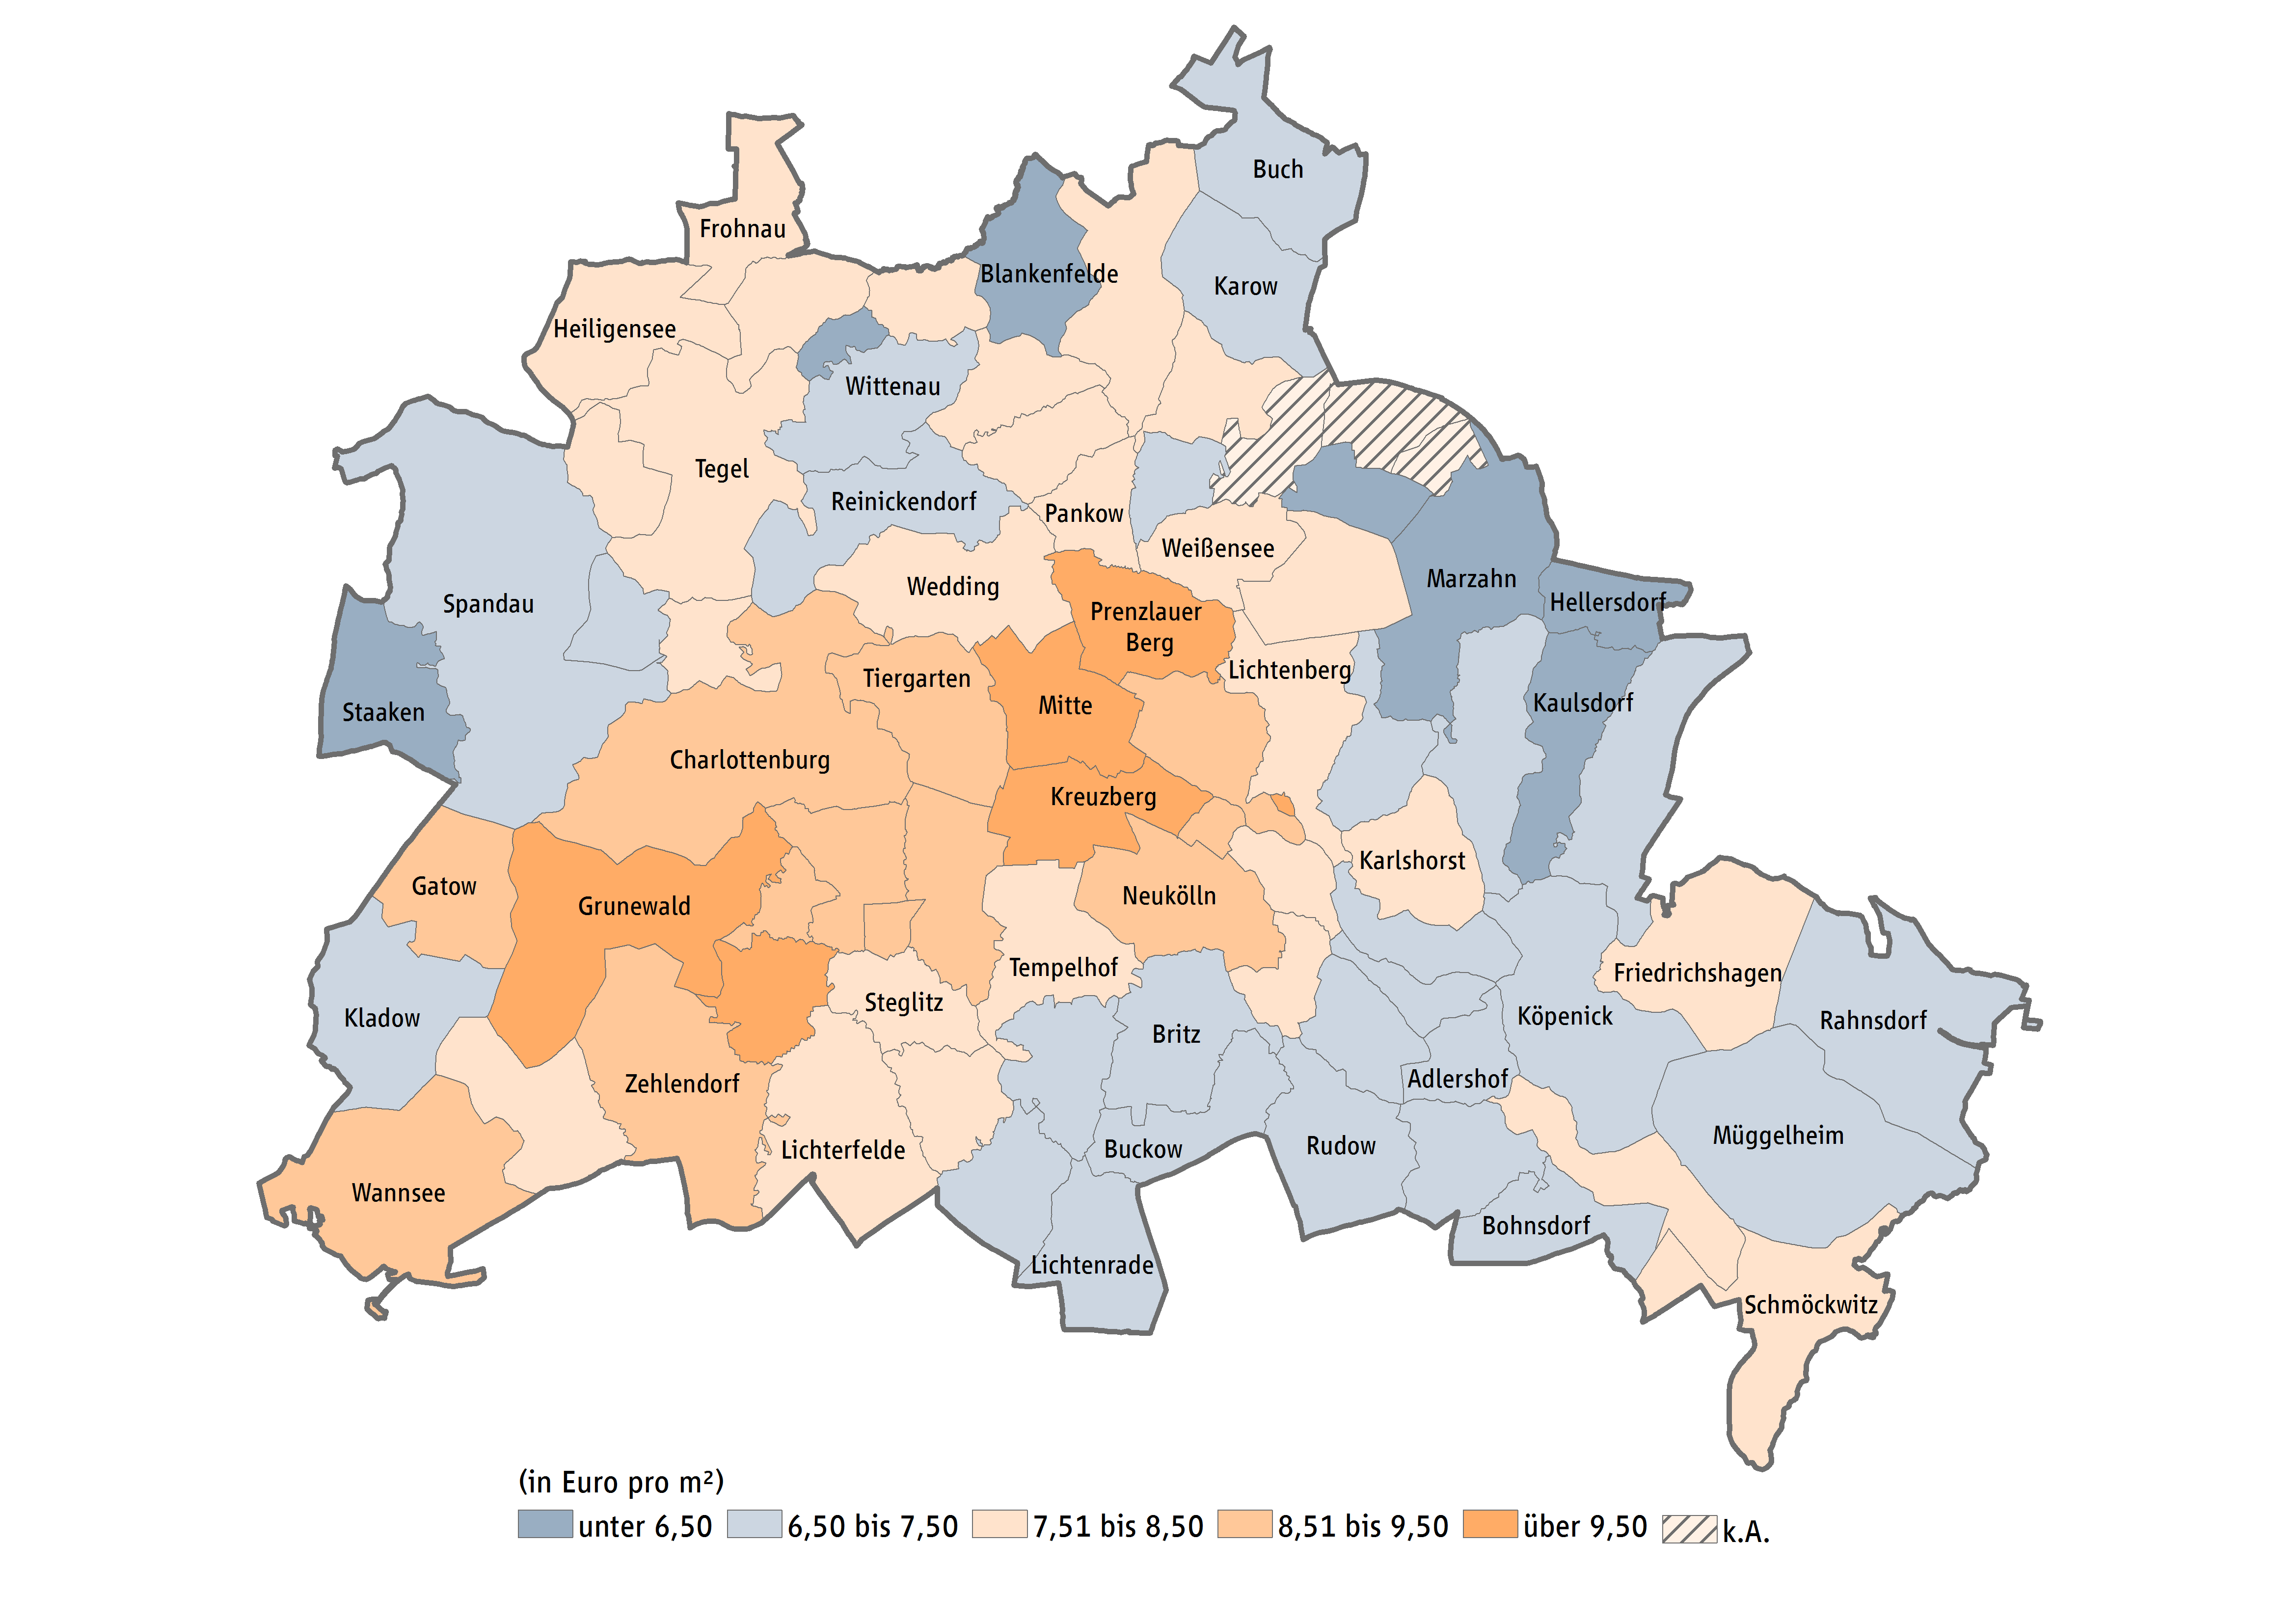 mietspiegel berlin immobilienpreise markttrends. Black Bedroom Furniture Sets. Home Design Ideas